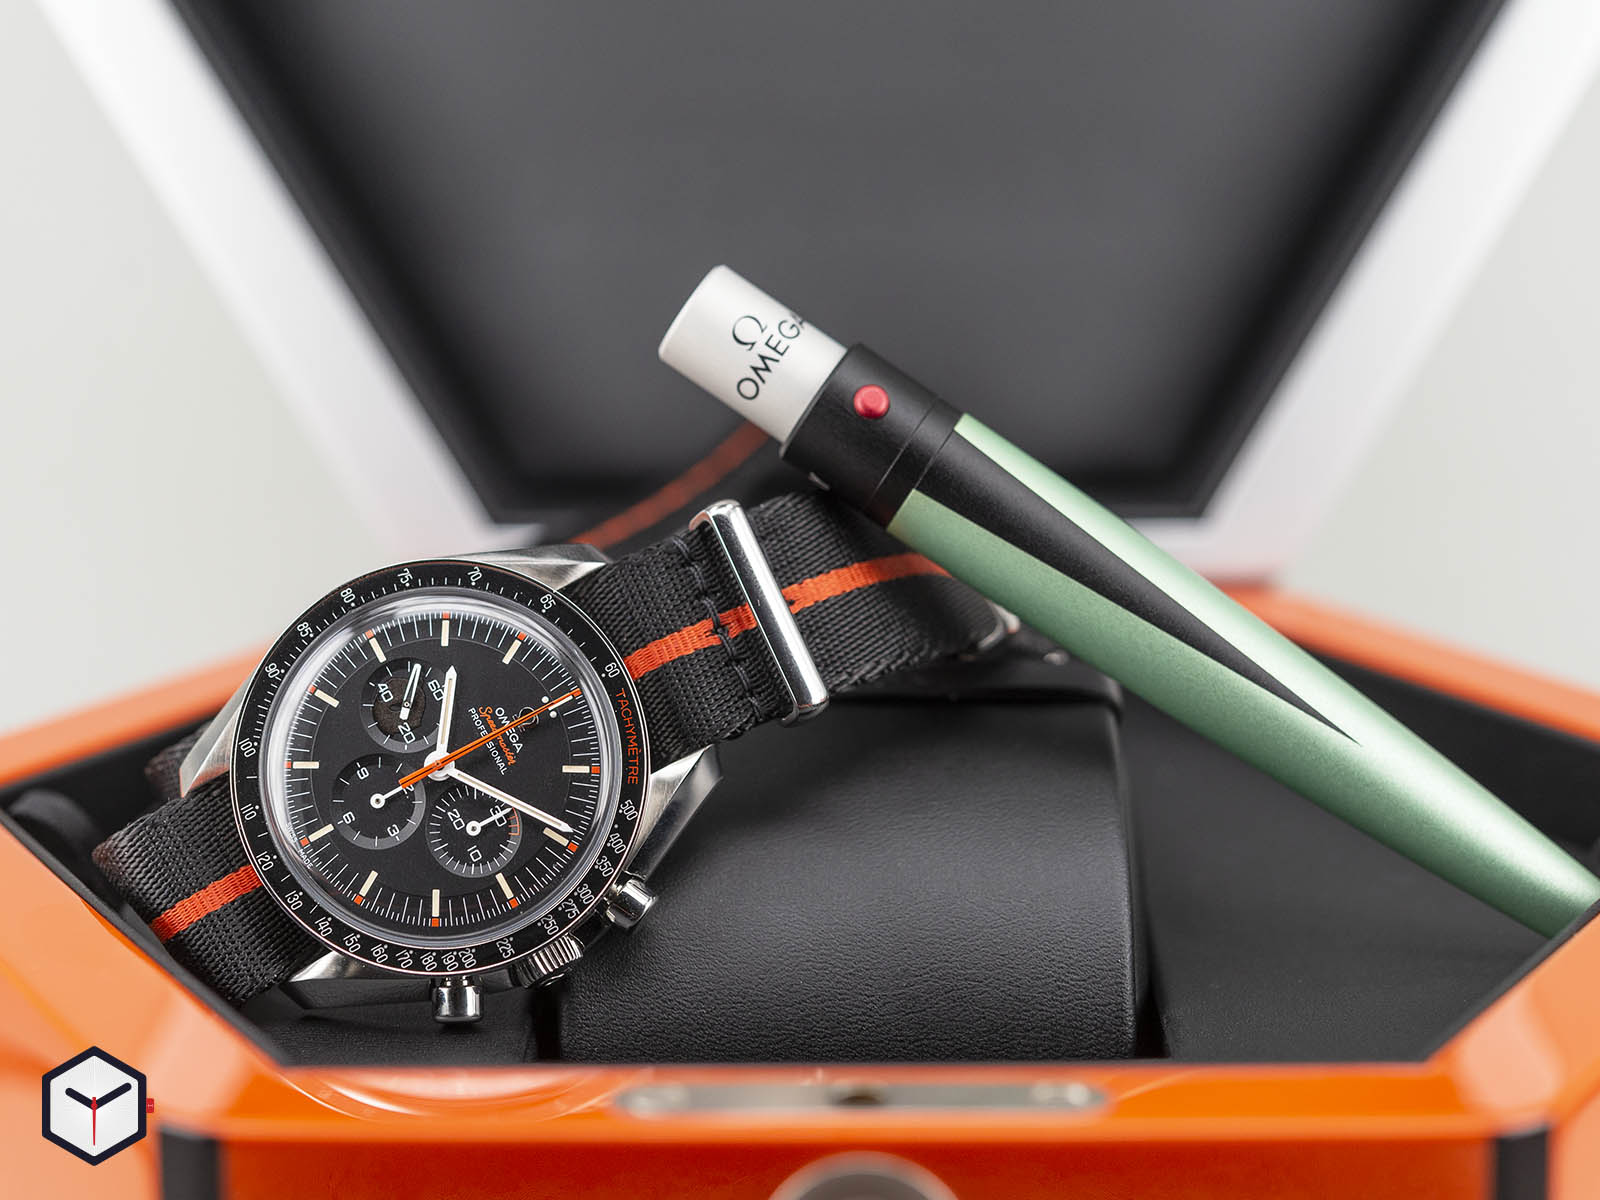 311-12-42-30-01-001-omega-speedmaster-speedy-tuesday-2018-edition-ultraman-5.jpg